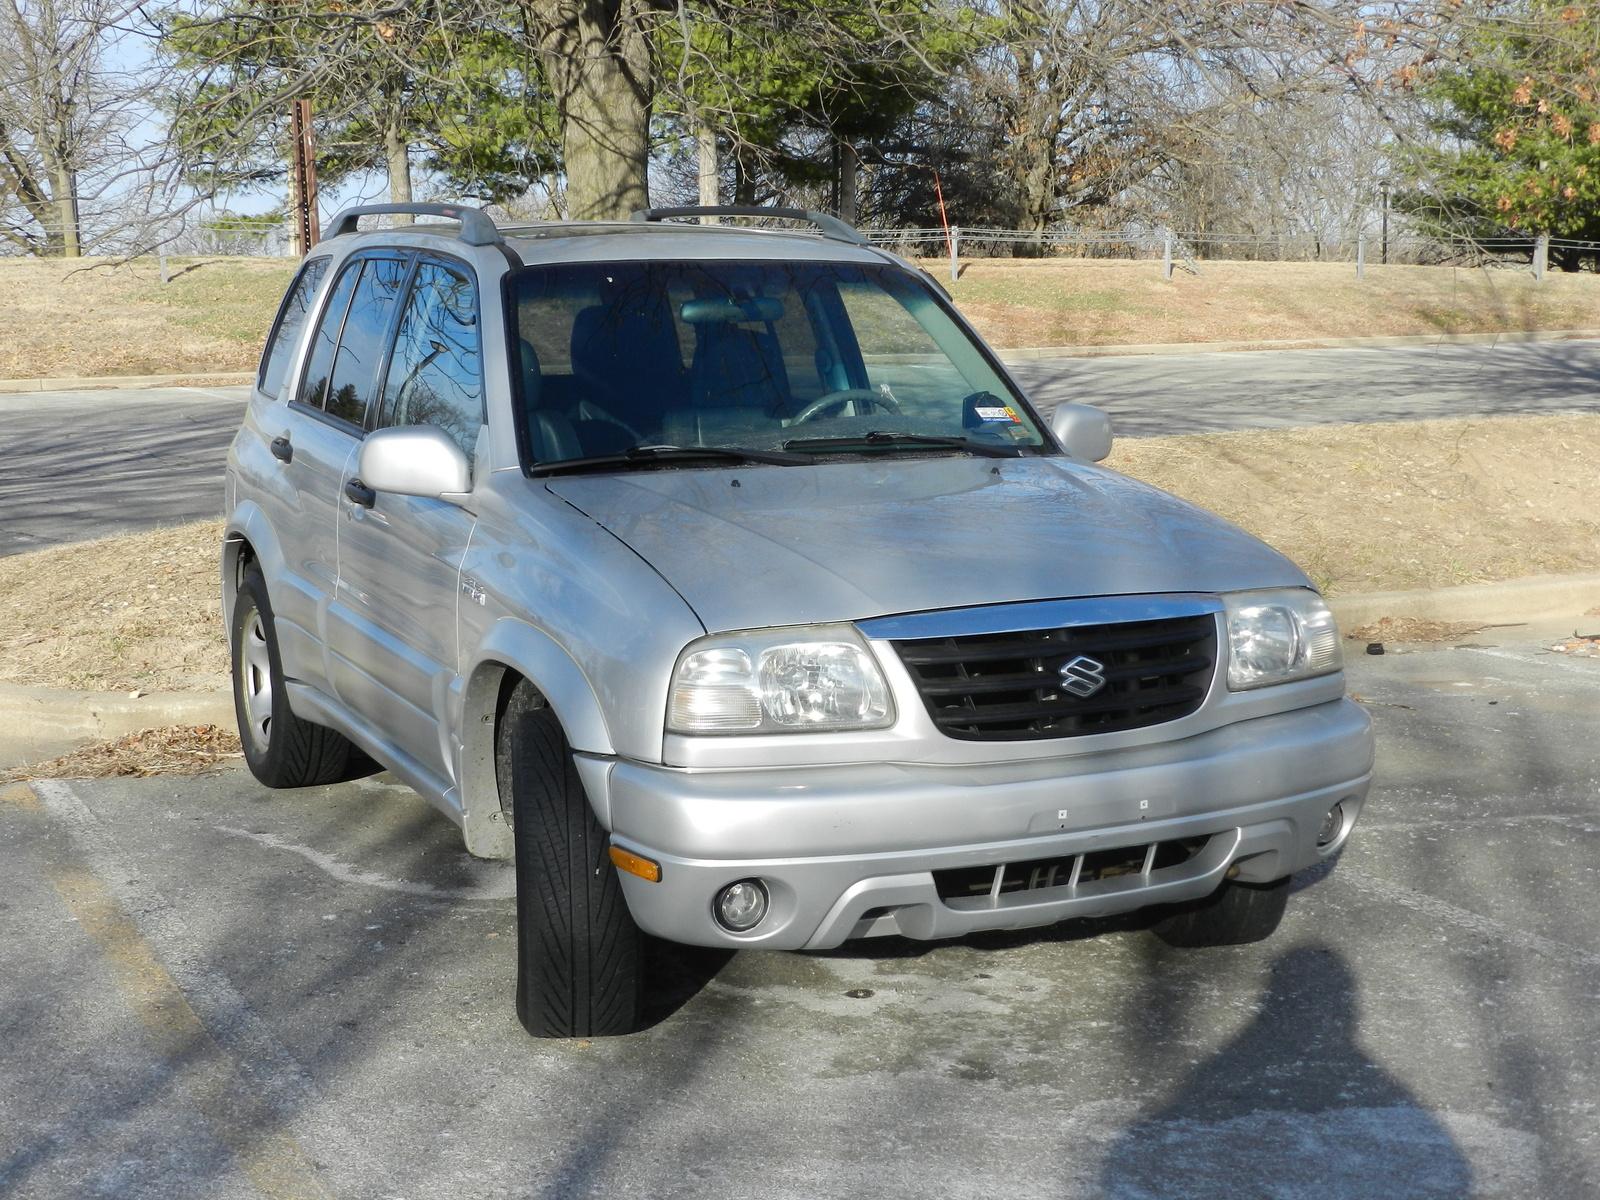 Picture of 2001 Suzuki Vitara 4 Dr JX 4WD SUV